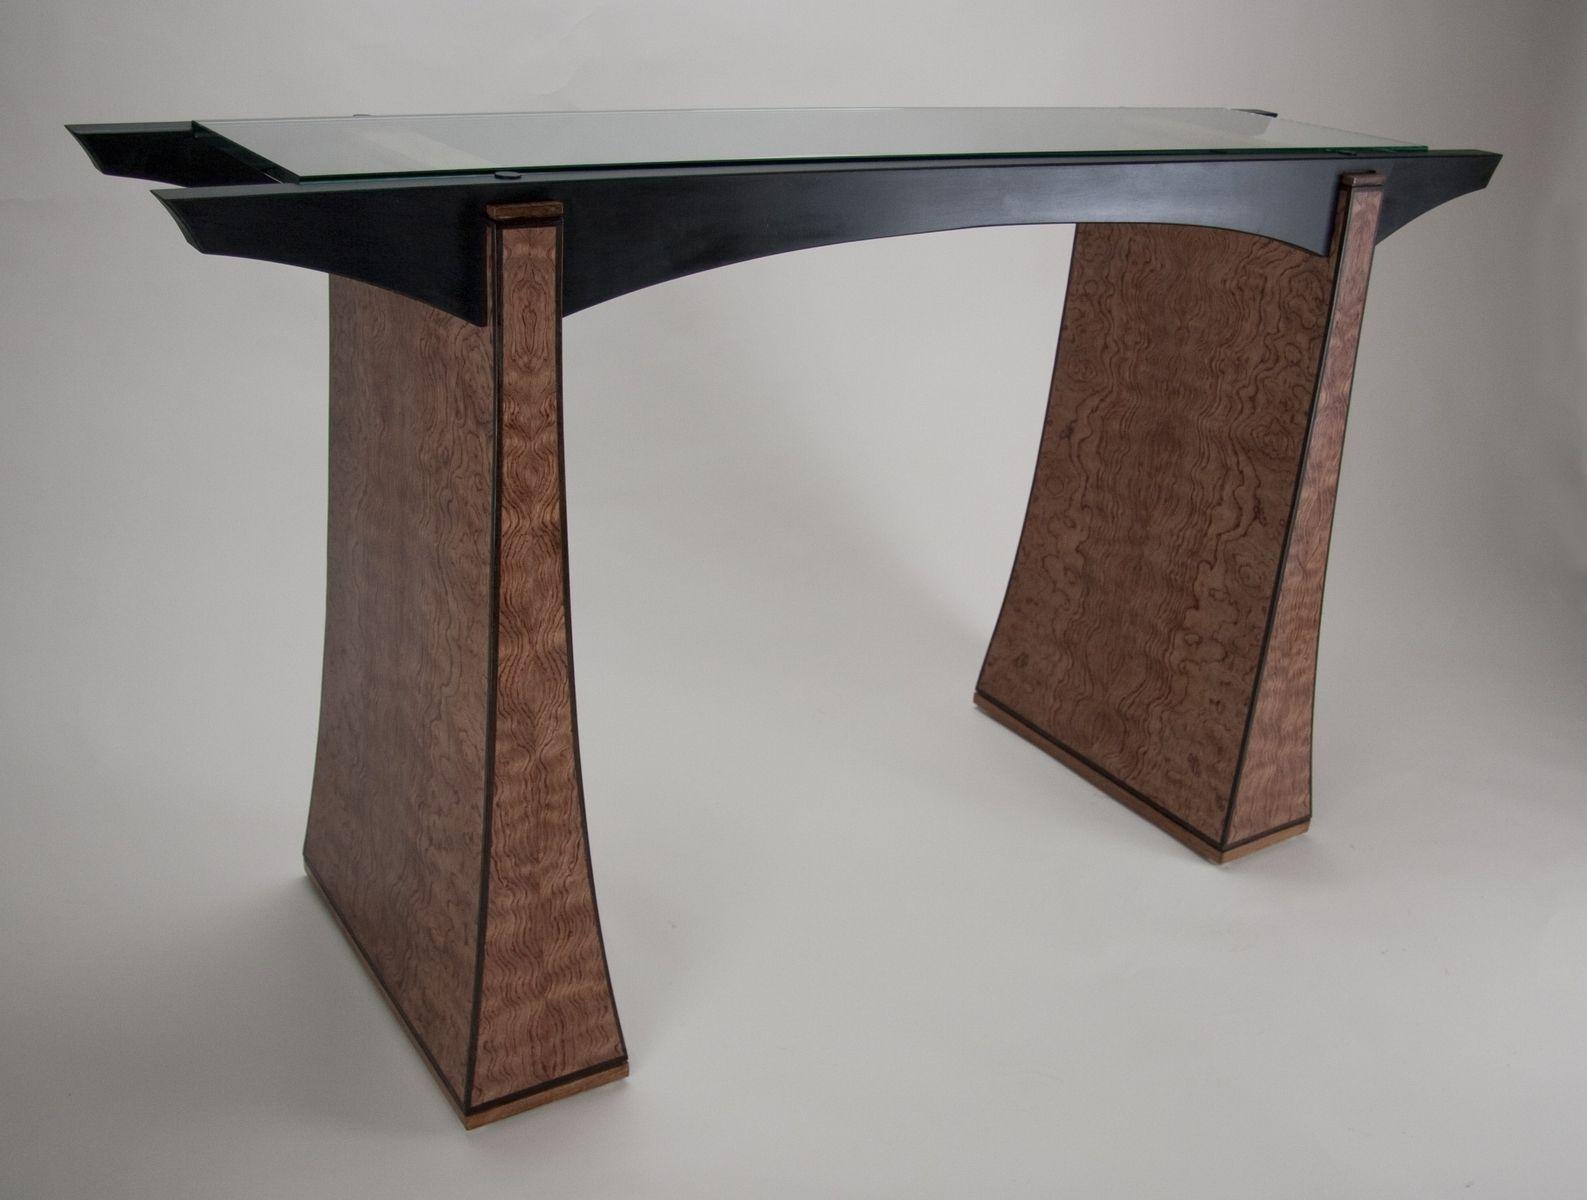 Narrow hallway decor  Choose the Suitable Hallway Tables for Our Home  hallway tables